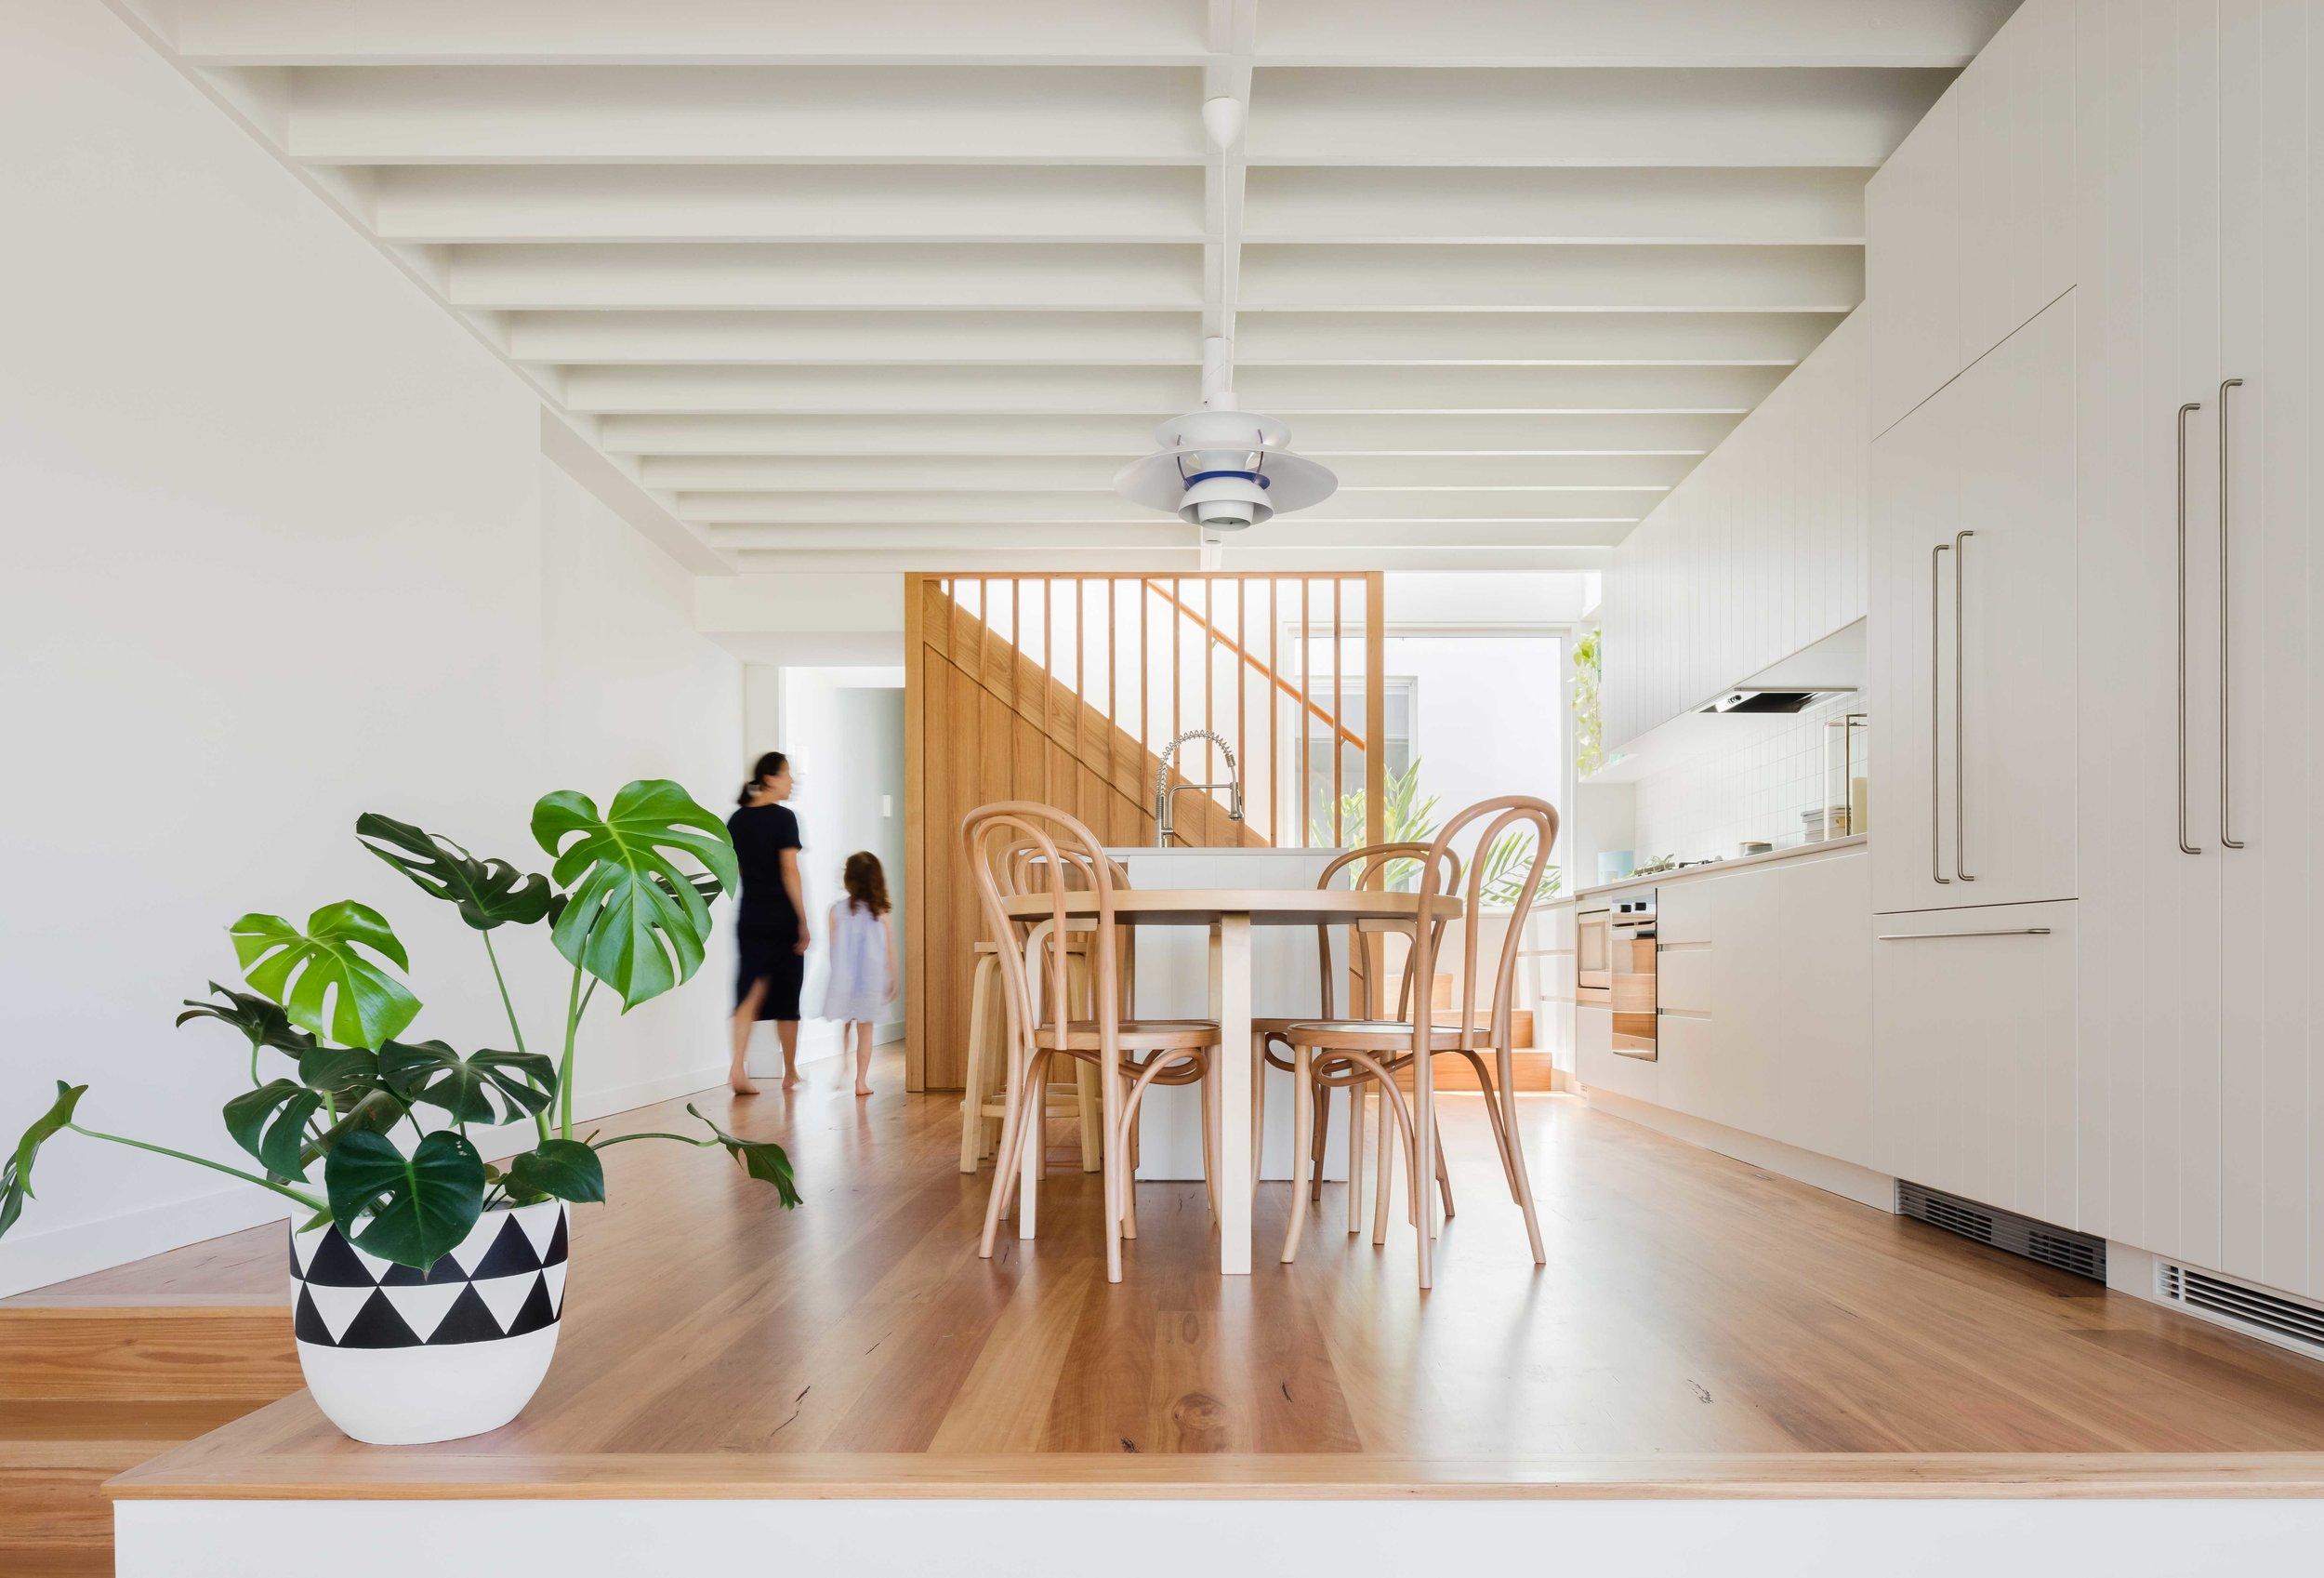 Surf-Box-01-©-Downie-North-Architects.jpg